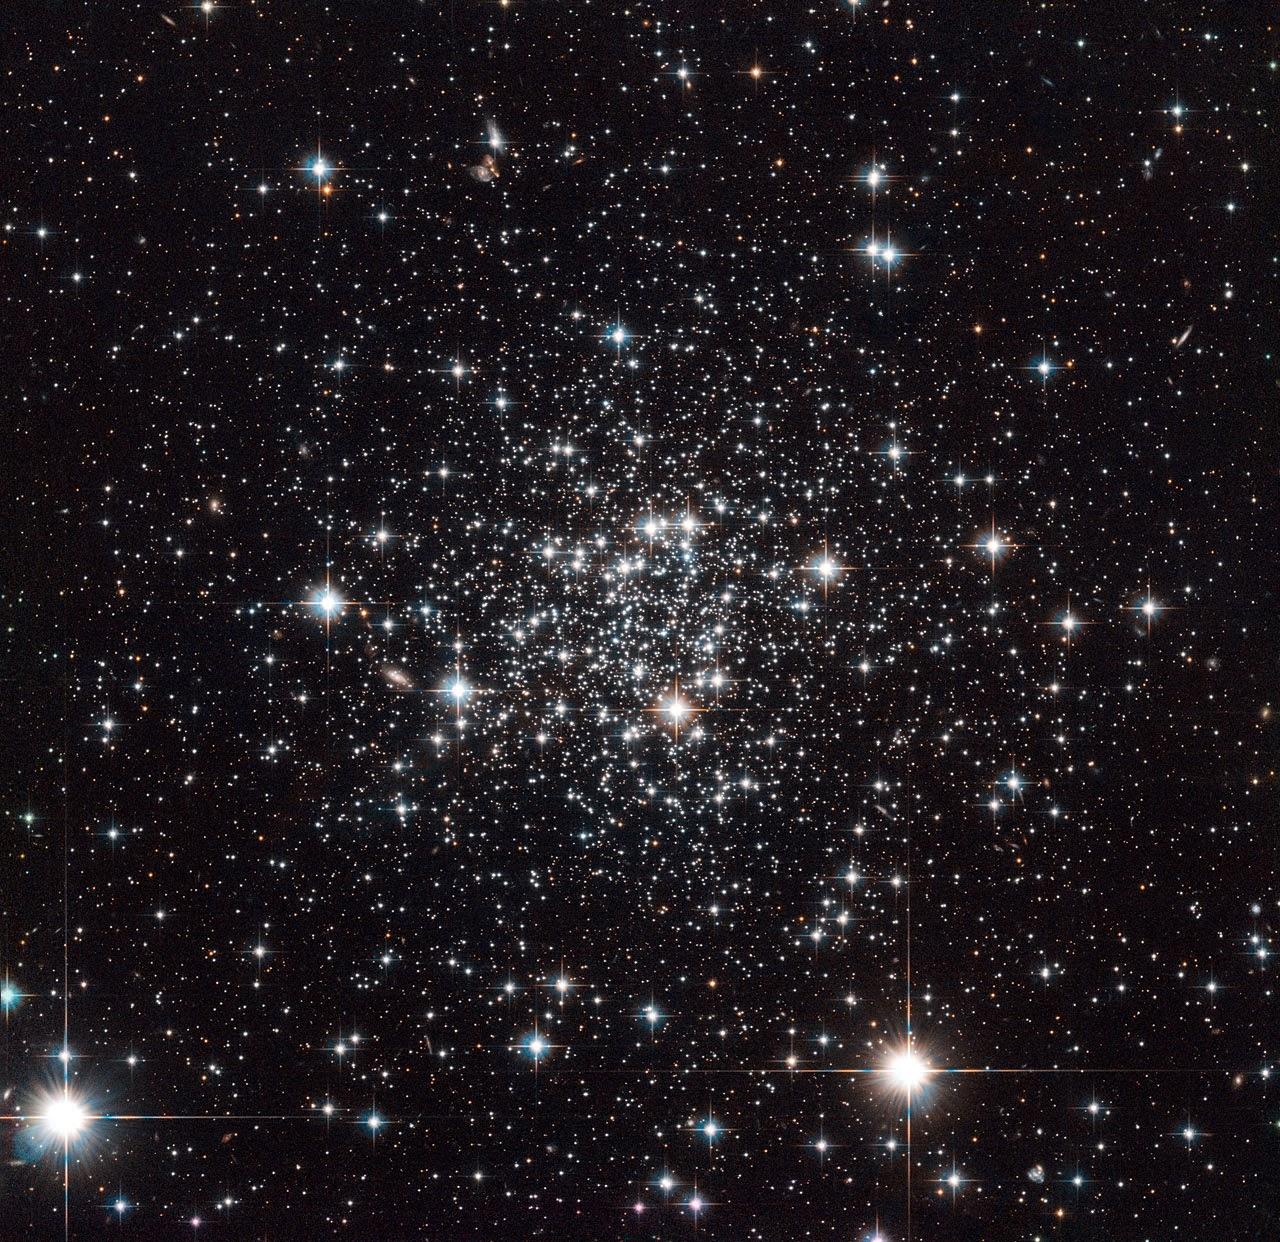 Шаровое звёздное скопление Терзан 7 (Terzan 7)